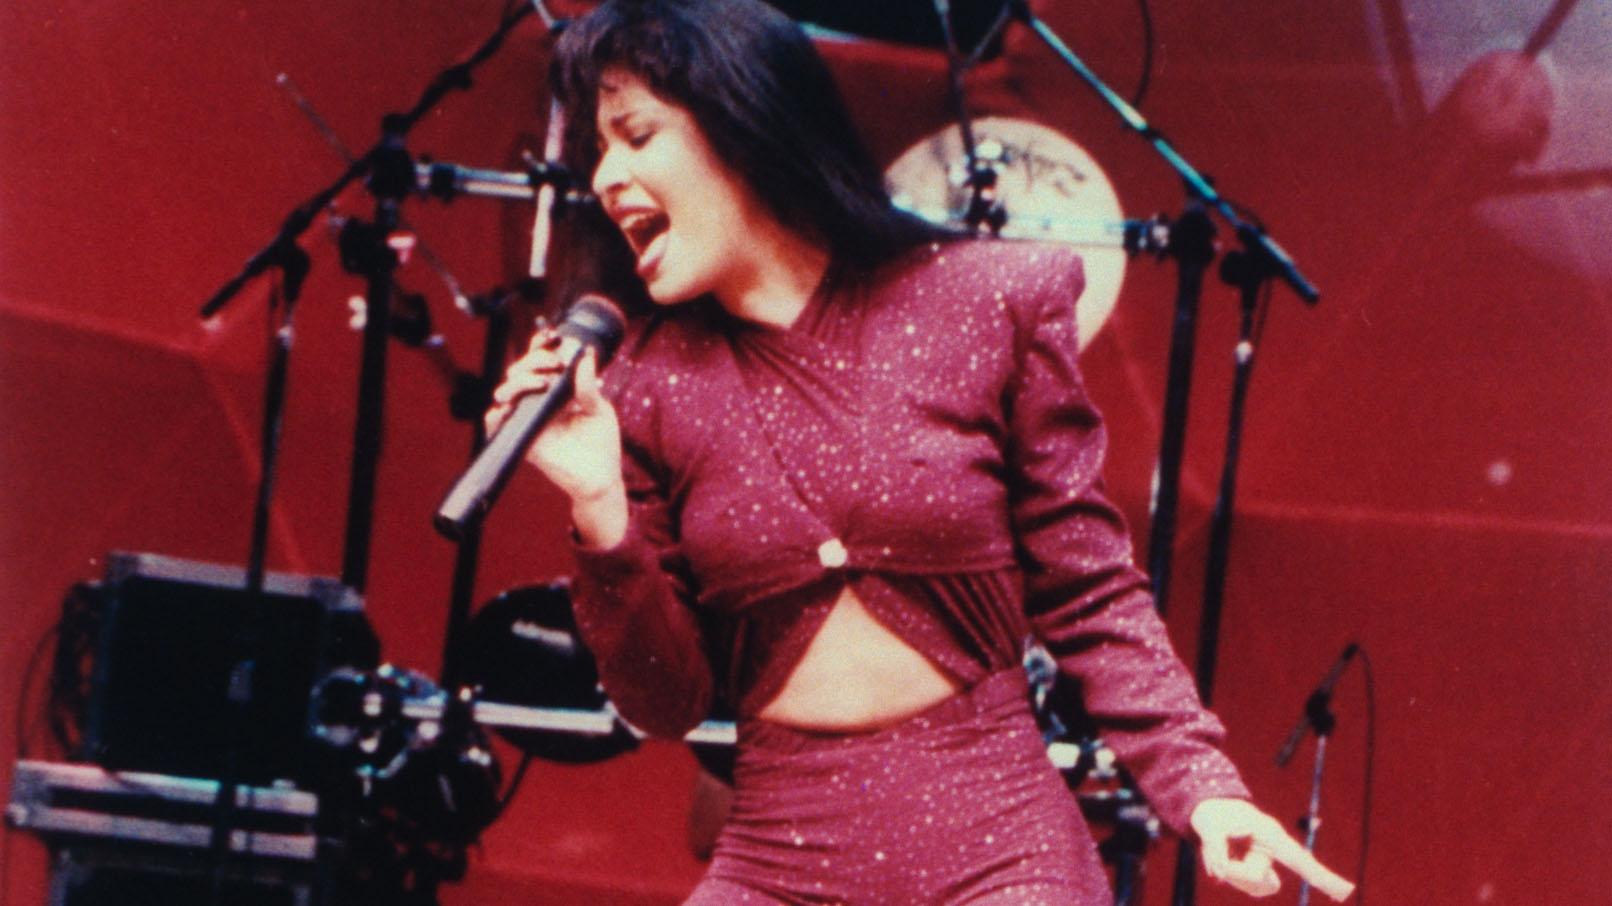 Niña británica de 4 años se vuelve viral por cantar canciones de Selena